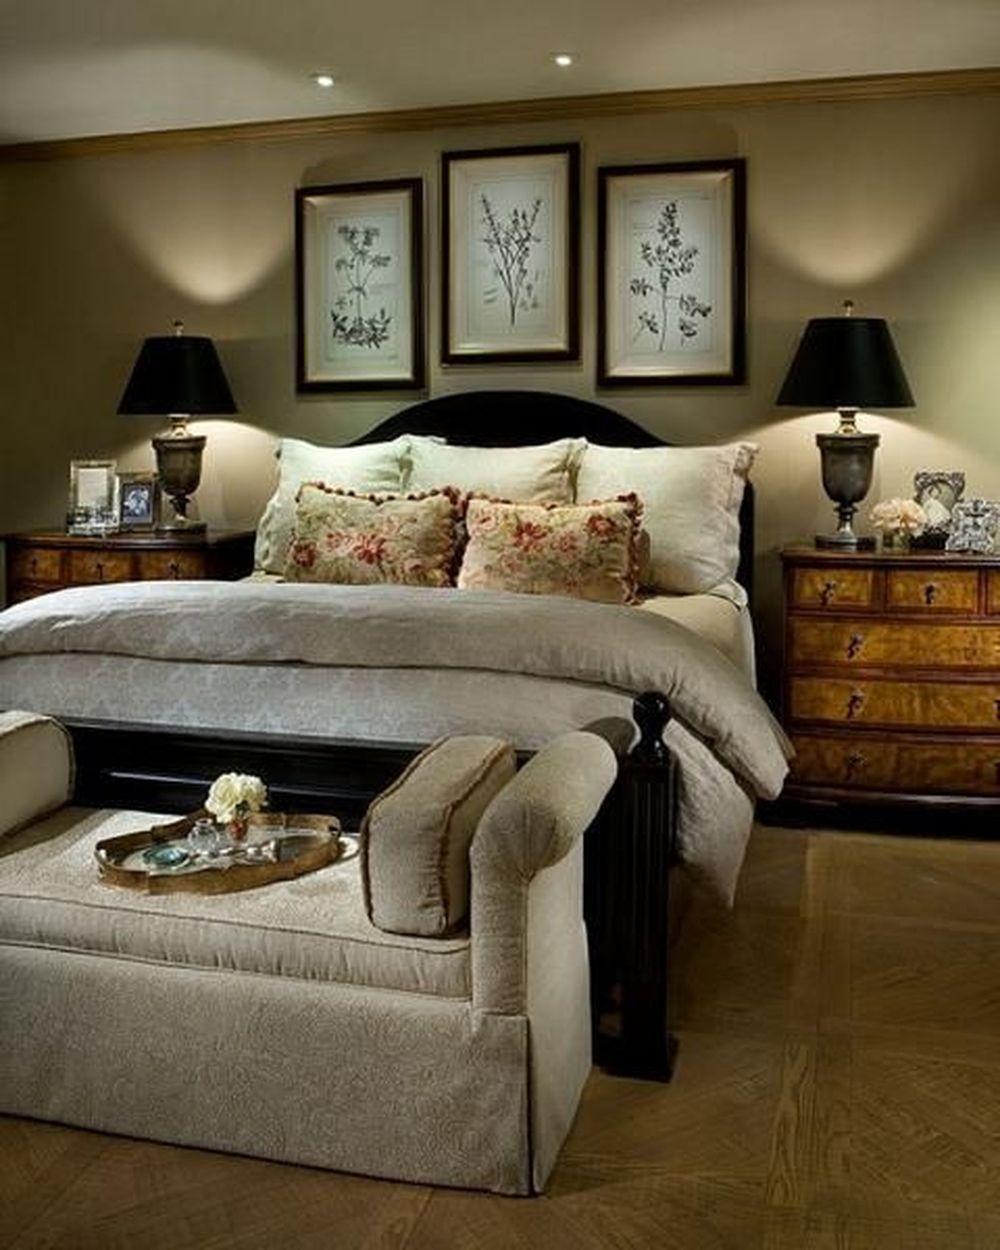 Beautiful Master Bedroom Decorating Ideas 62: 53 Beautiful Master Bedroom Ideas For Winter